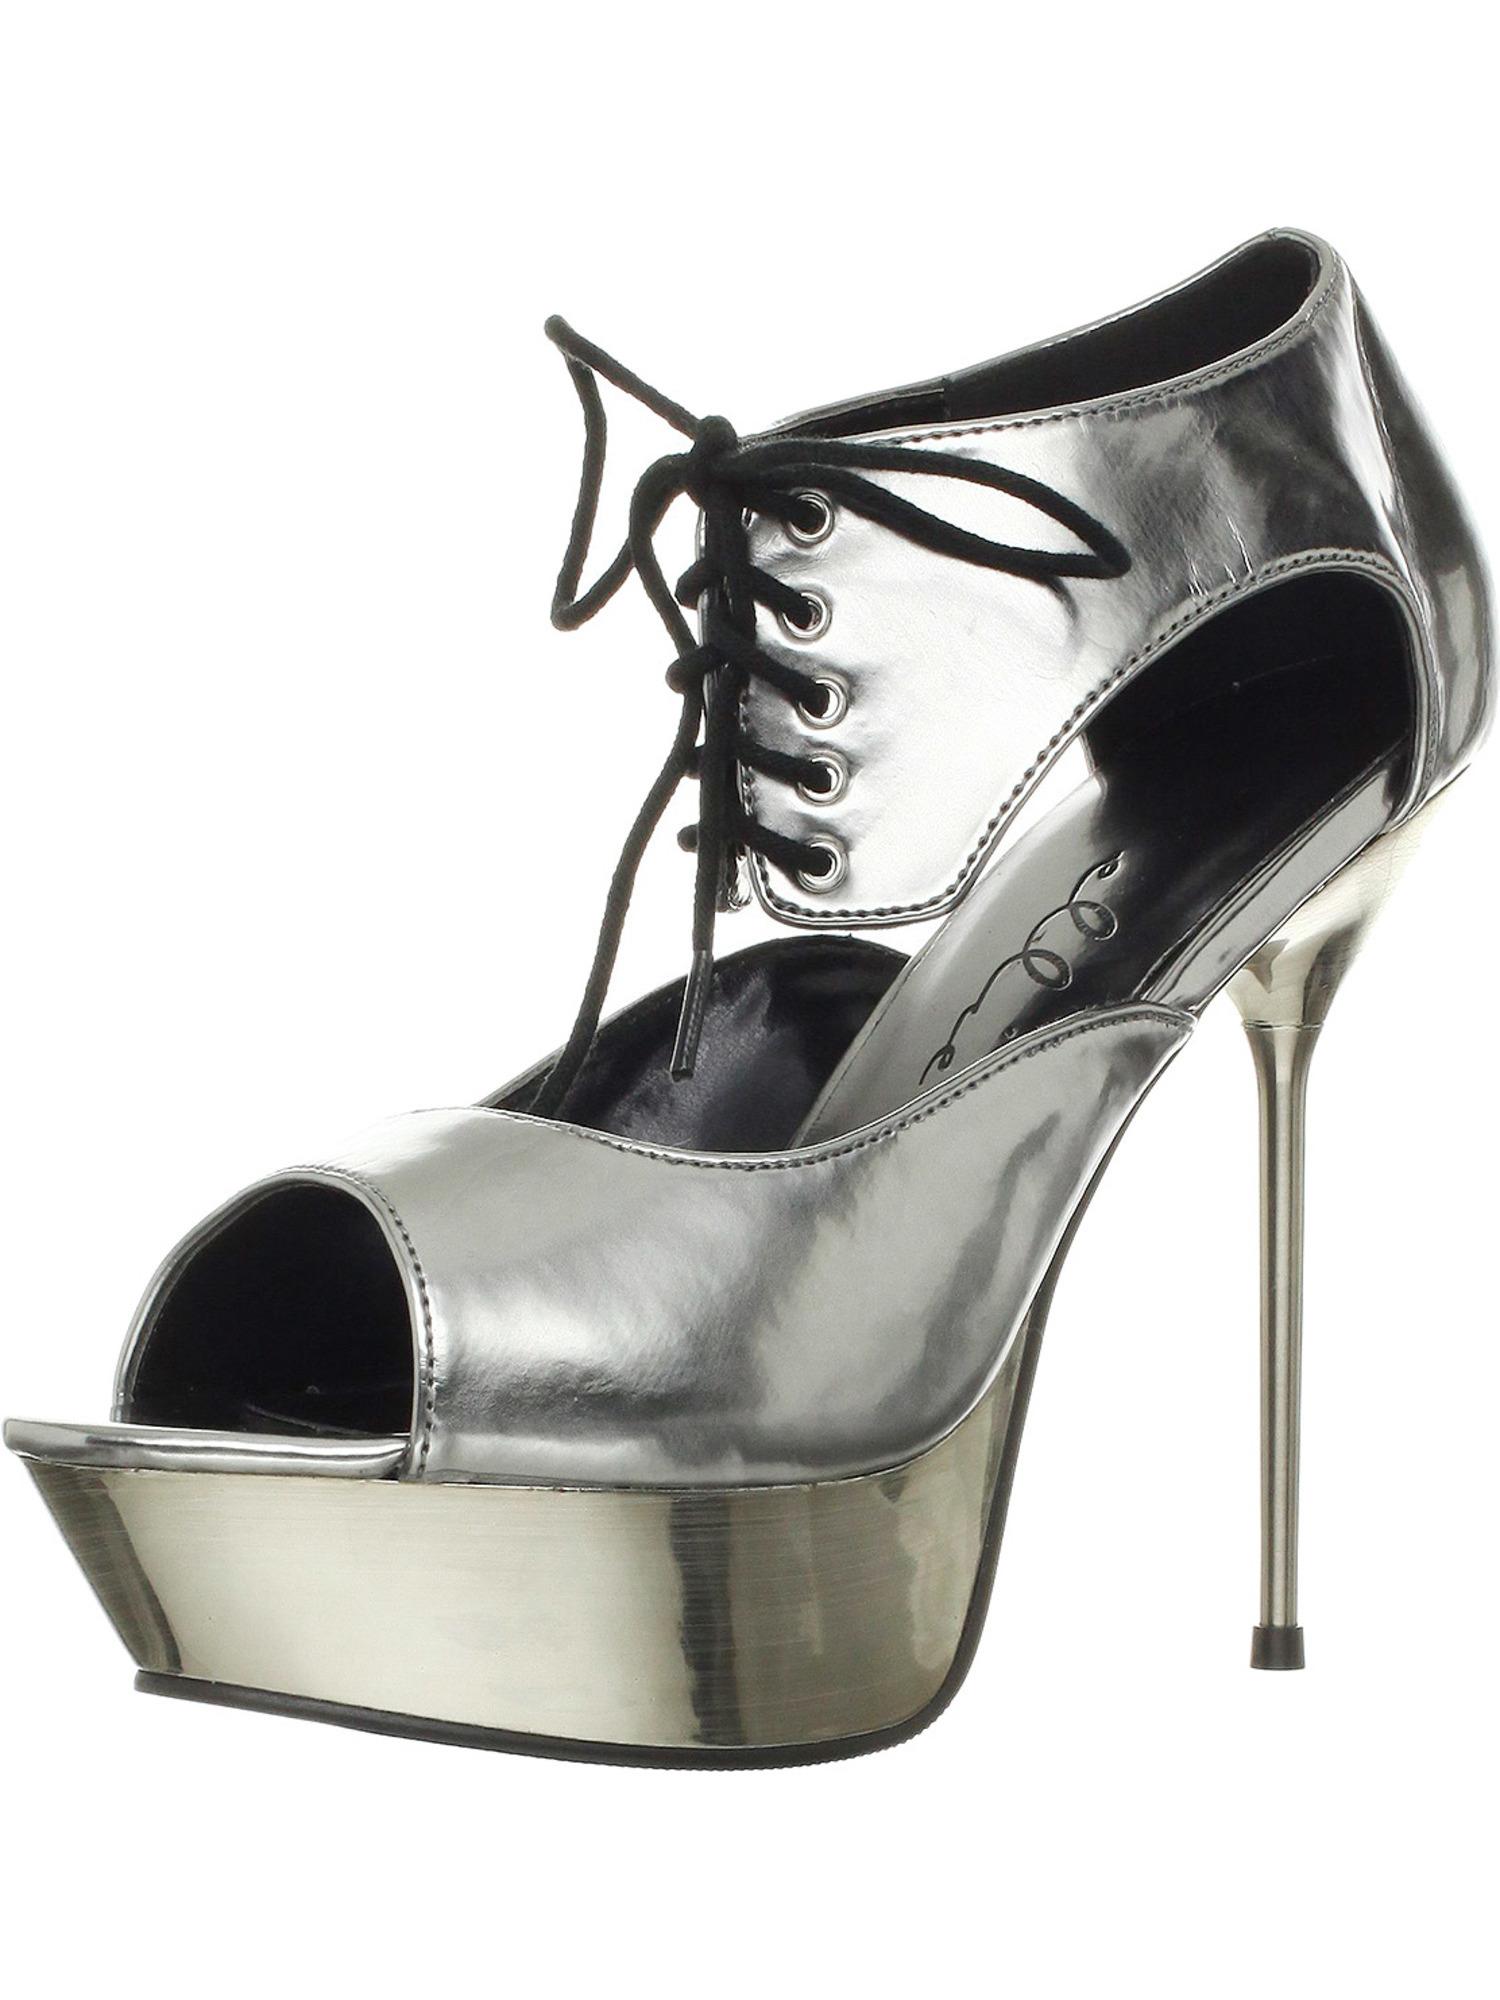 5 Inch High Heel Womens Sandals Metallic Platform Lace Up Shoes Stiletto Heel